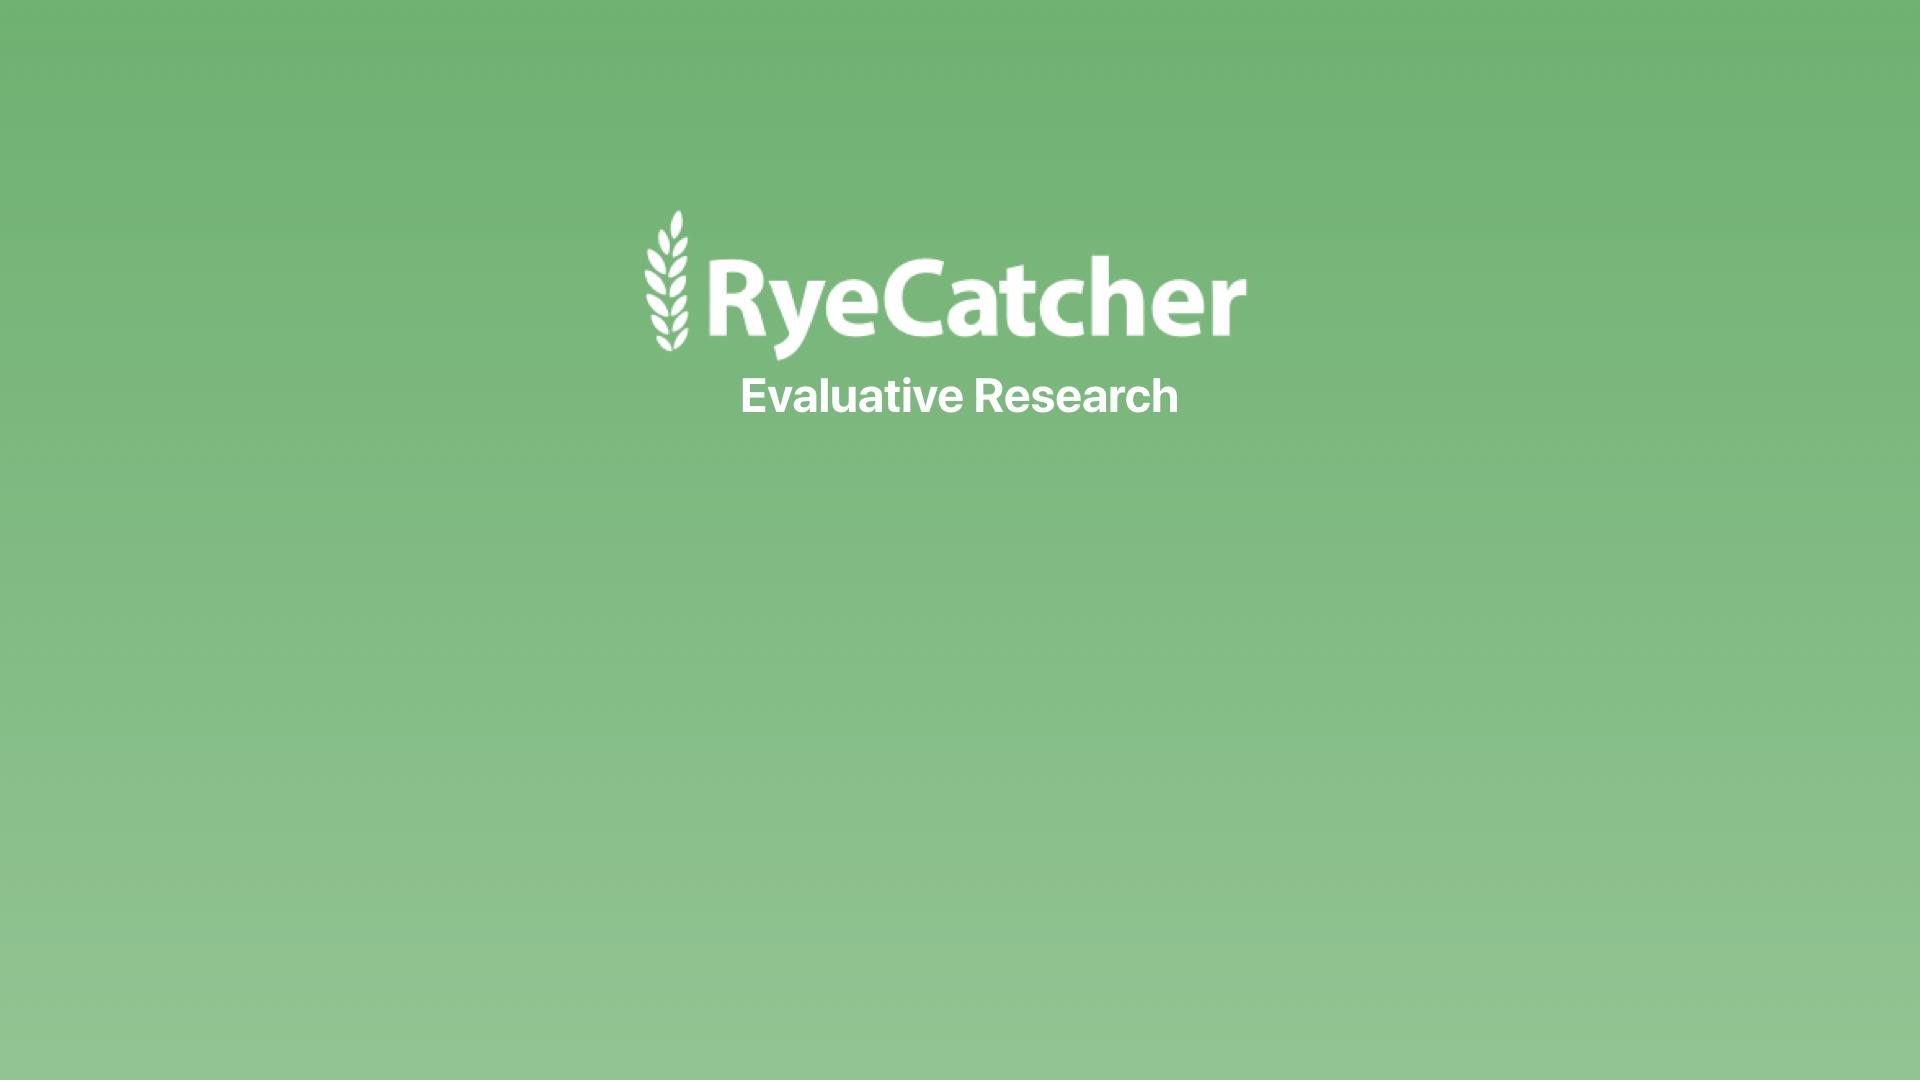 RyeCatcher-EvaluativeResearch (1).001.jpeg